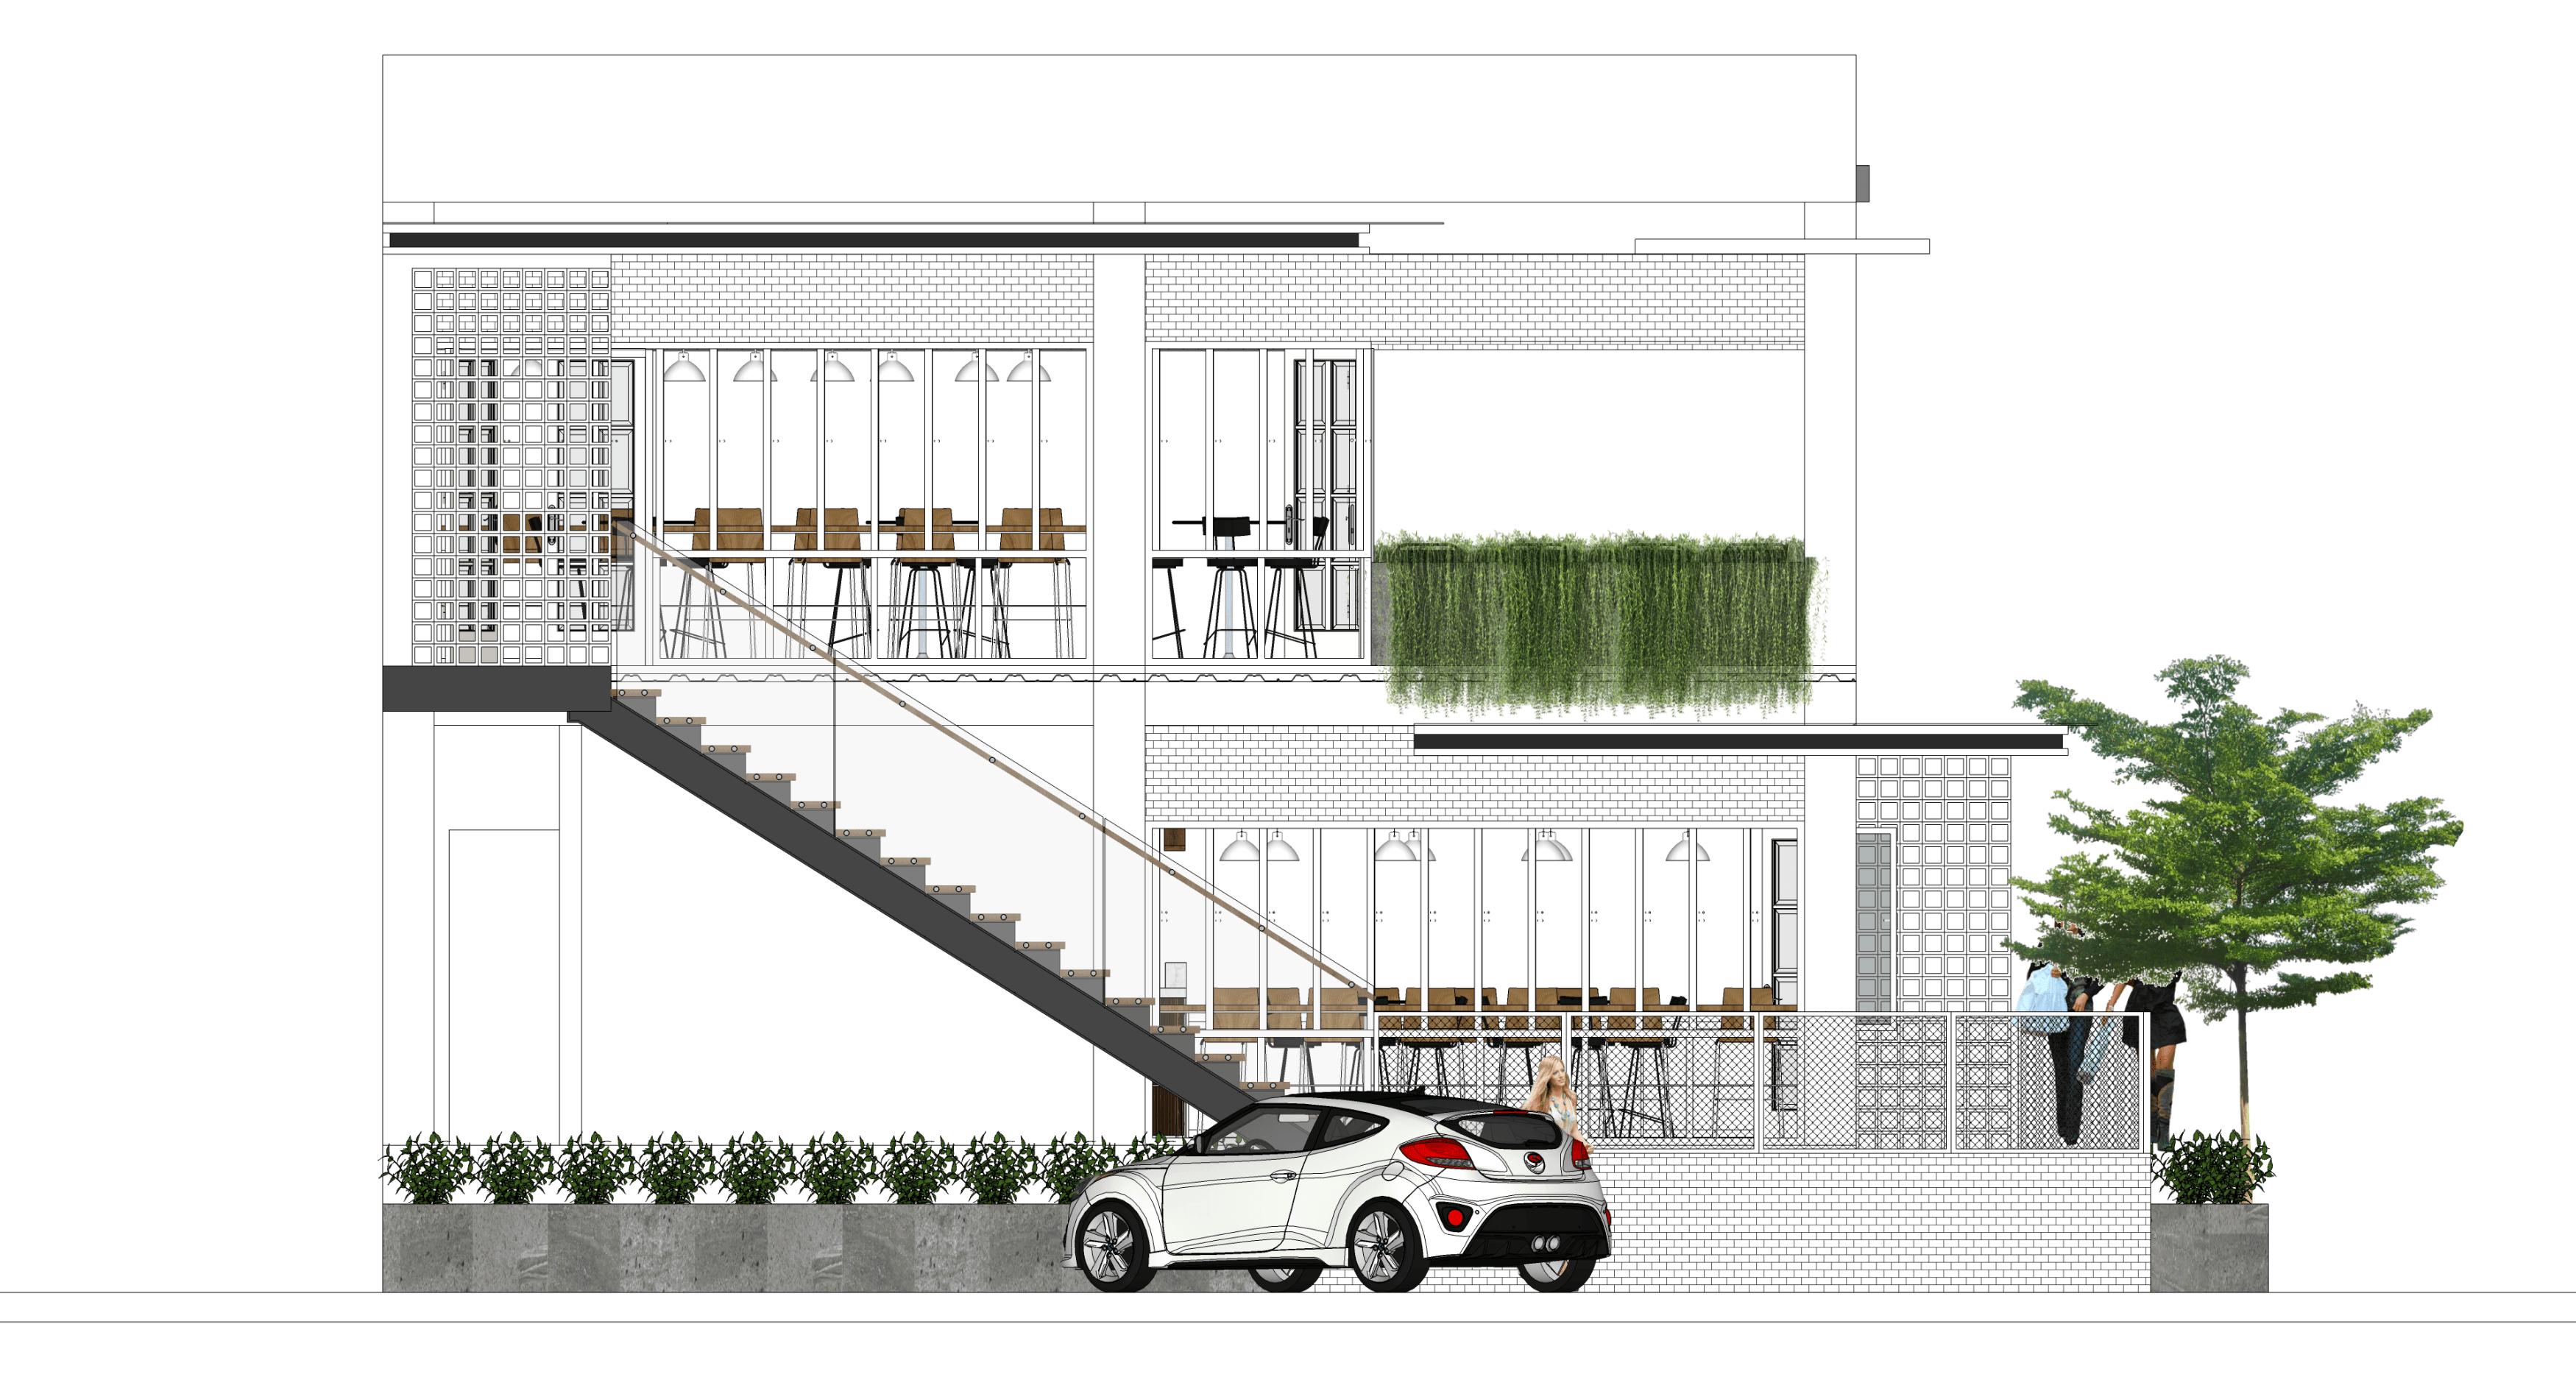 Astabumi Architect & Interior Design Institut Kopi Tegal Tegal, Kota Tegal, Jawa Tengah, Indonesia Tegal, Kota Tegal, Jawa Tengah, Indonesia Astabumi-Architect-Interior-Design-Institut-Kopi-Tegal   83515